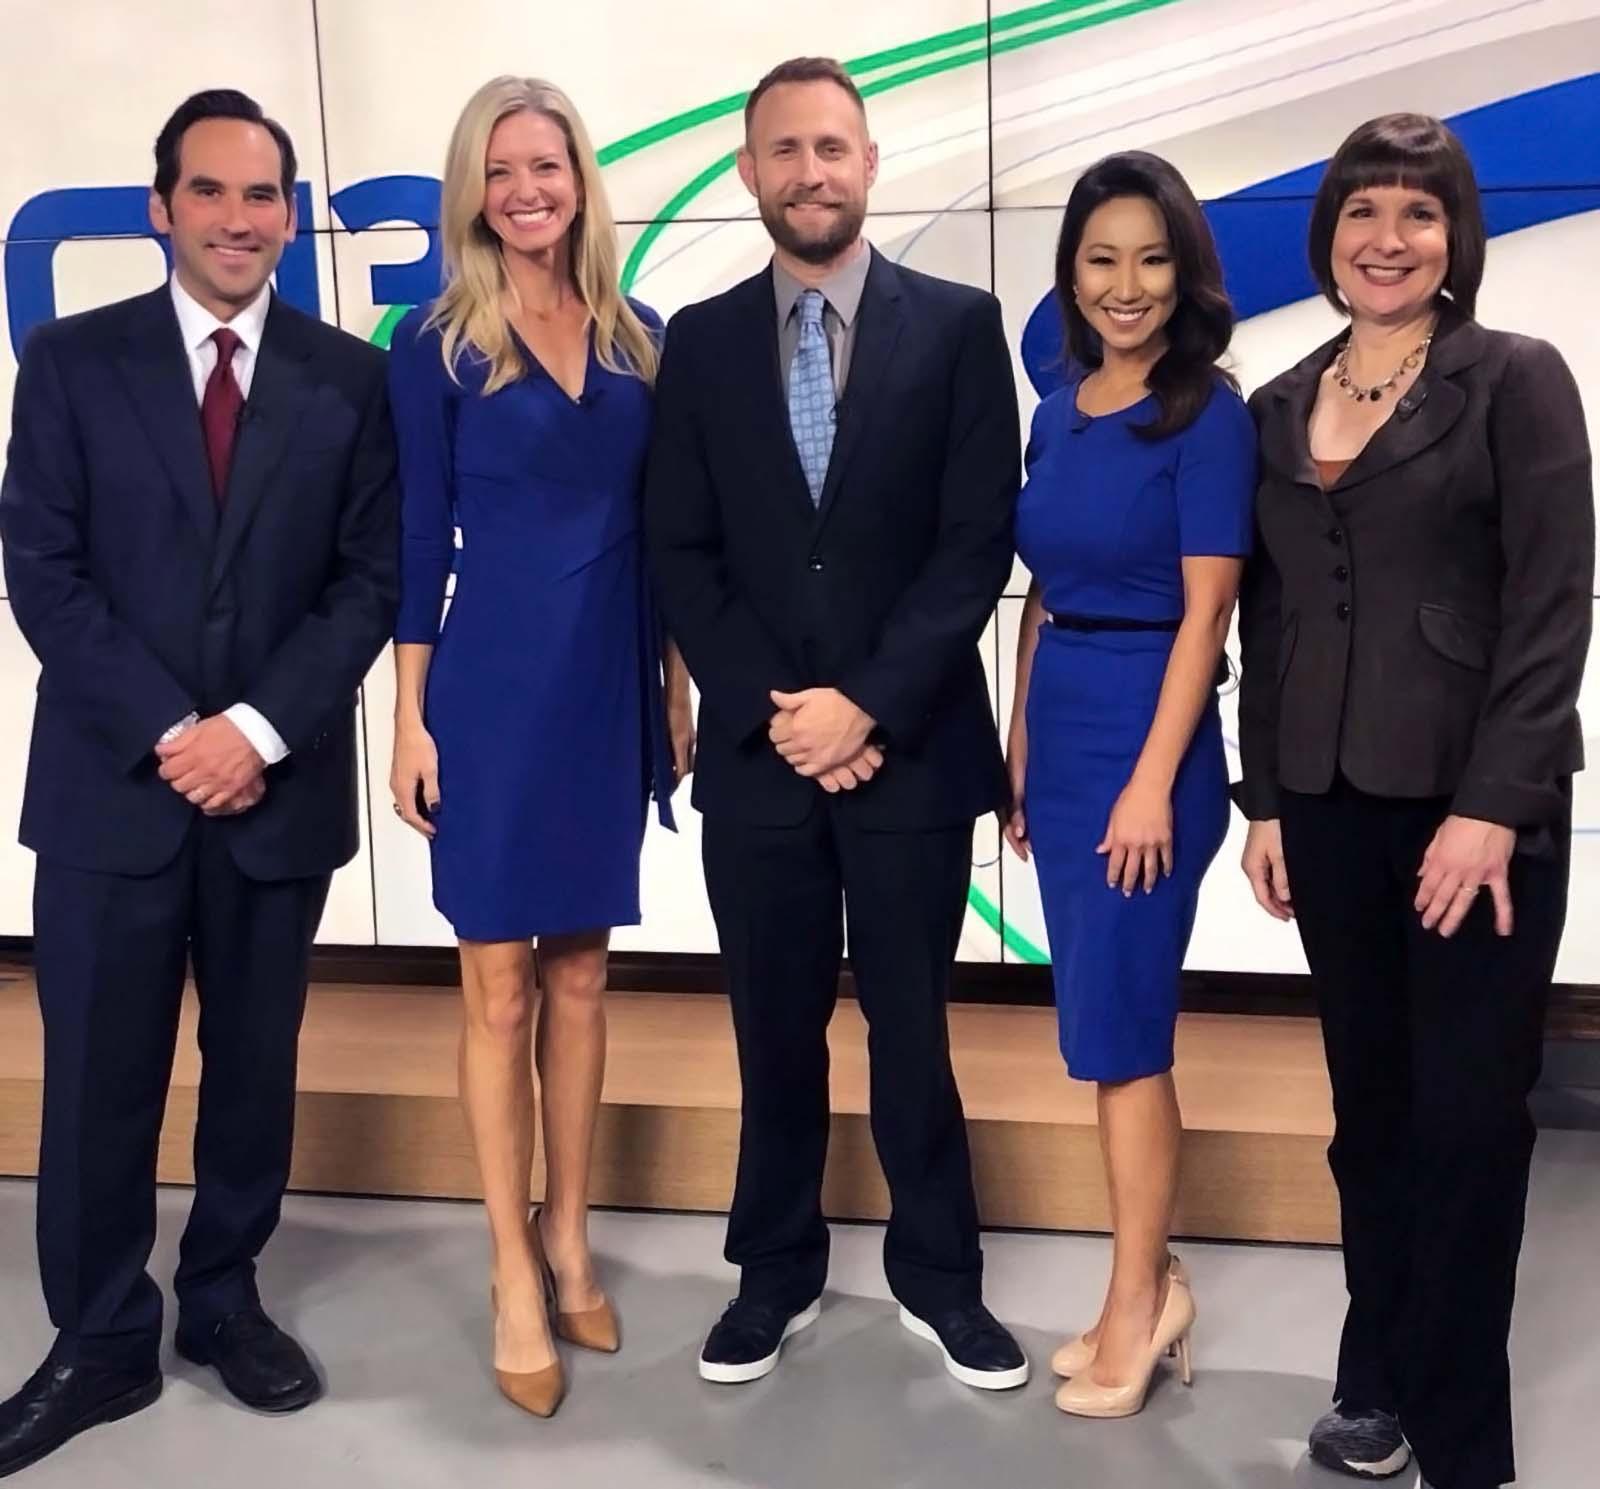 Q13 Fox News Anchors - Walter Kelley, Erin Mayovsky, Tim Joyce, Grace Lim, and M.j. McDermott